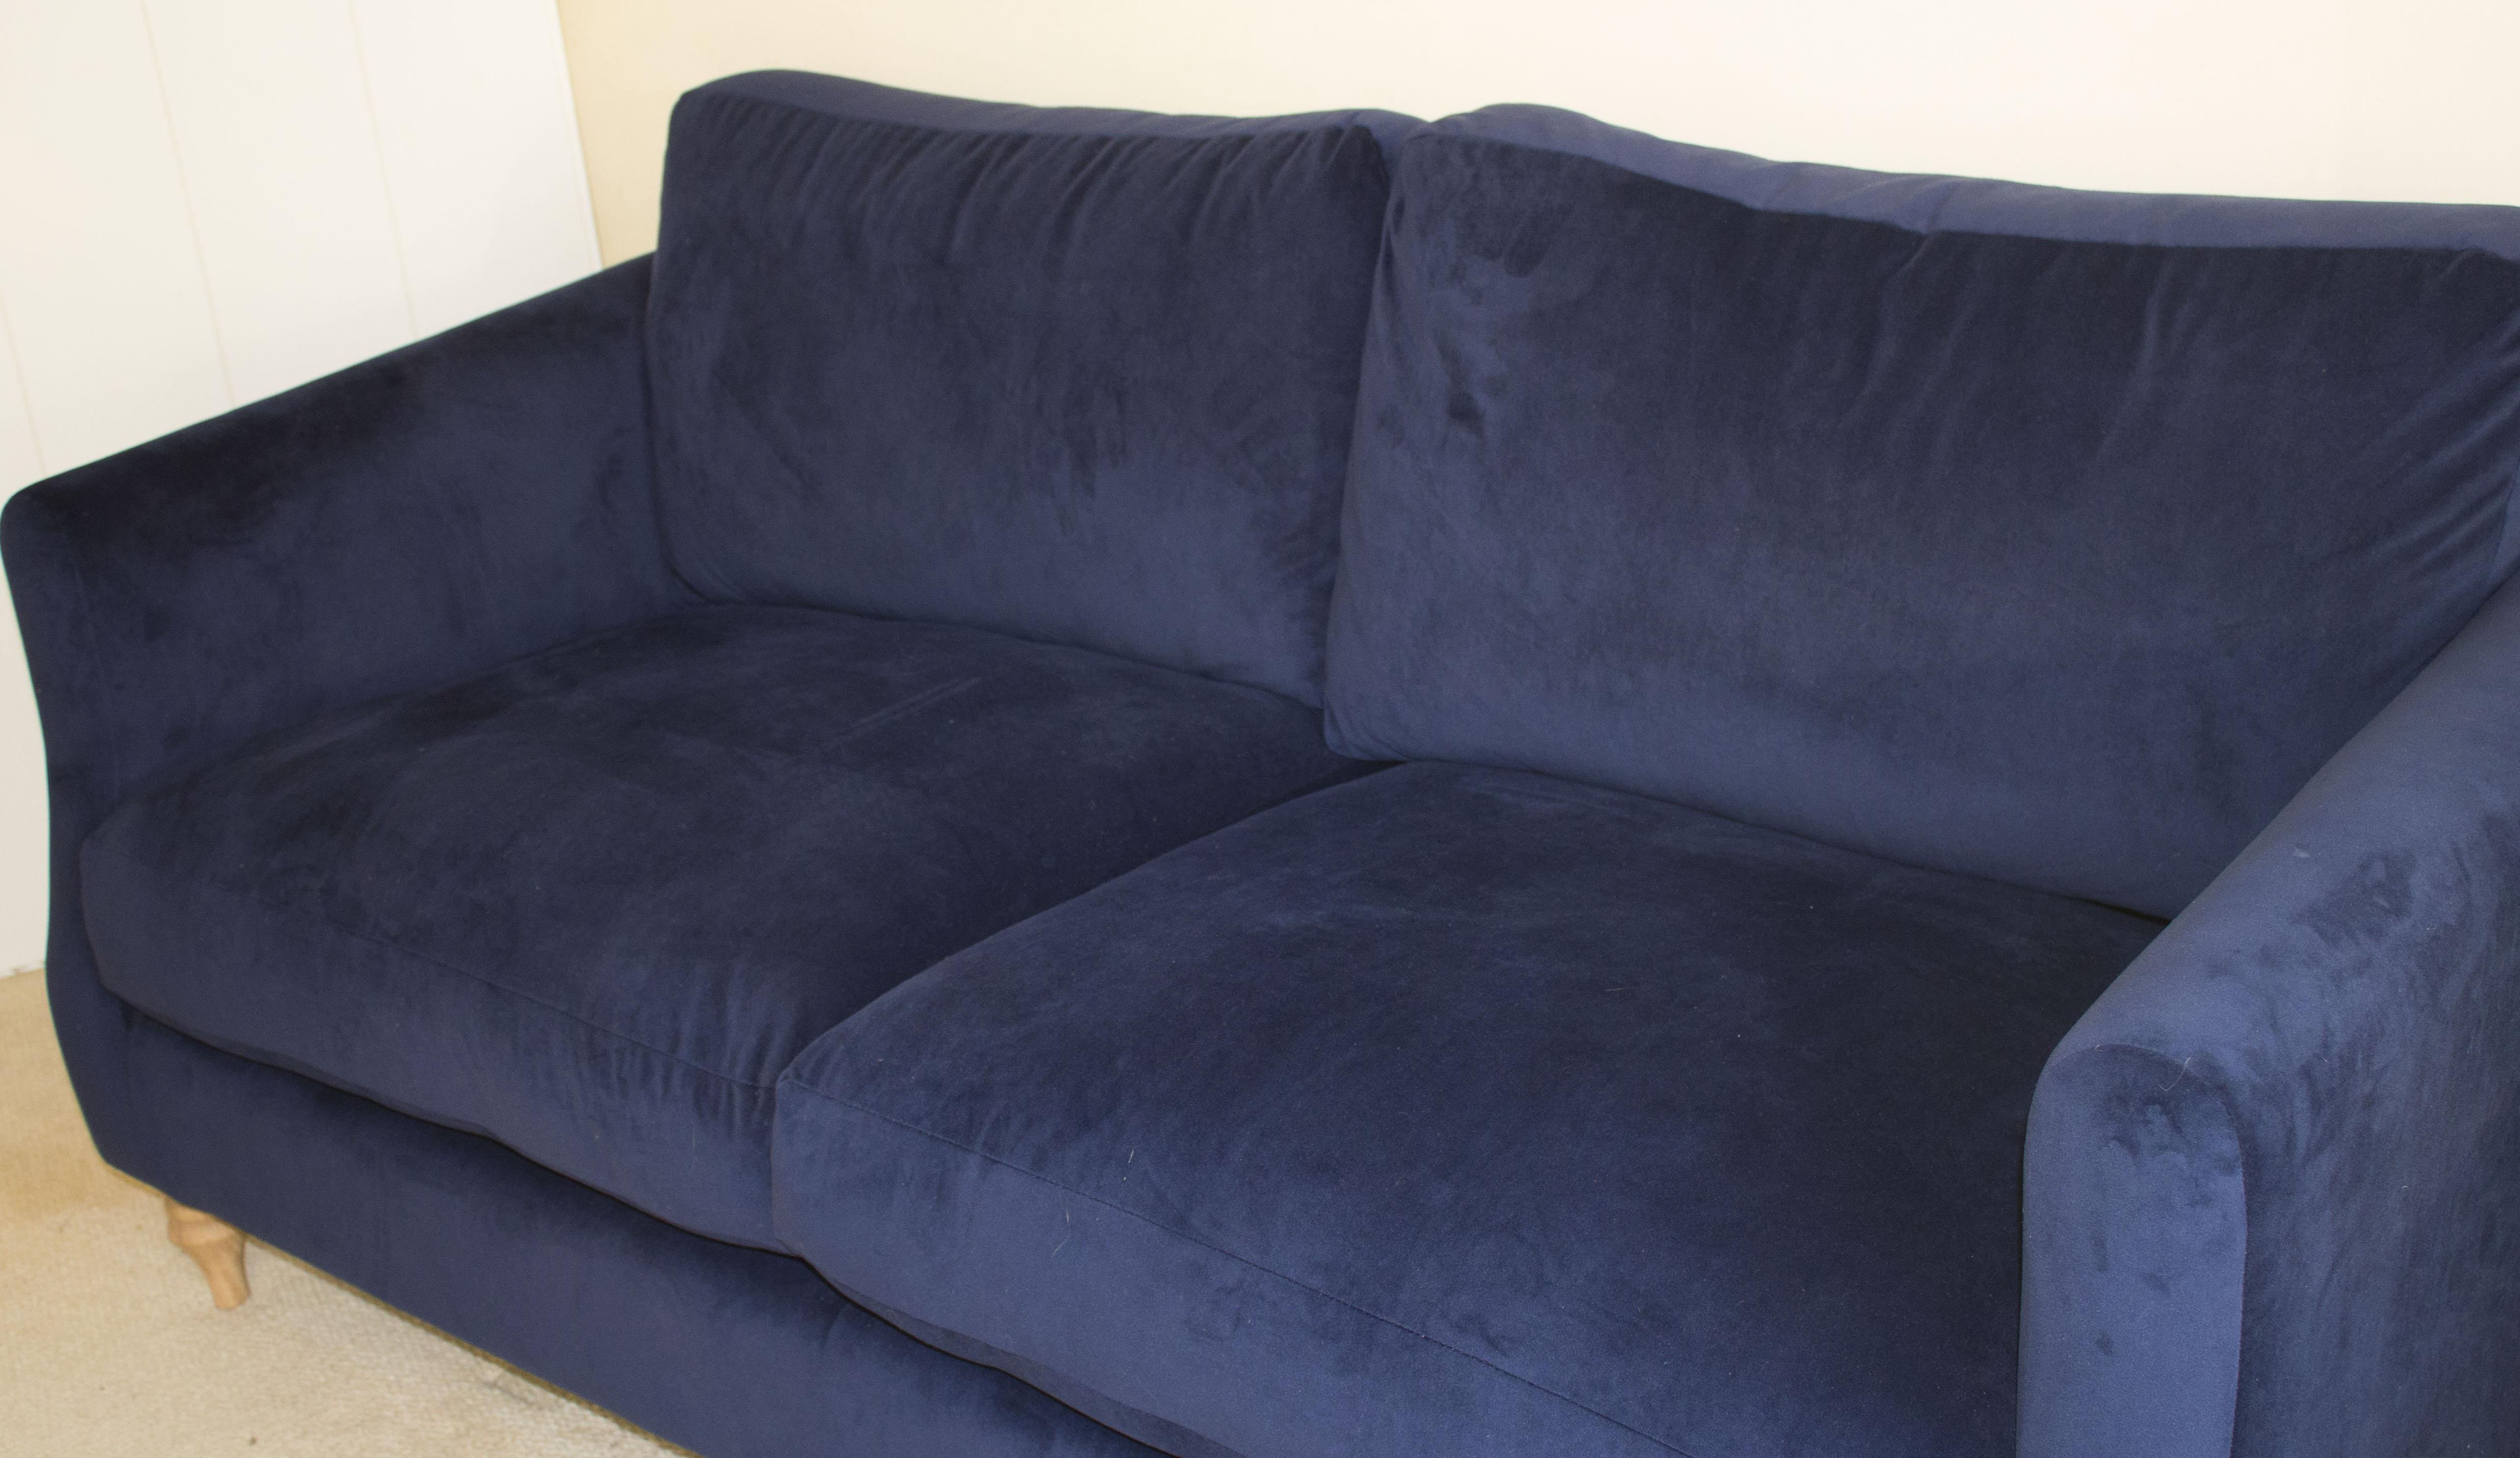 Sofa Unenbered Dad Blog Uk